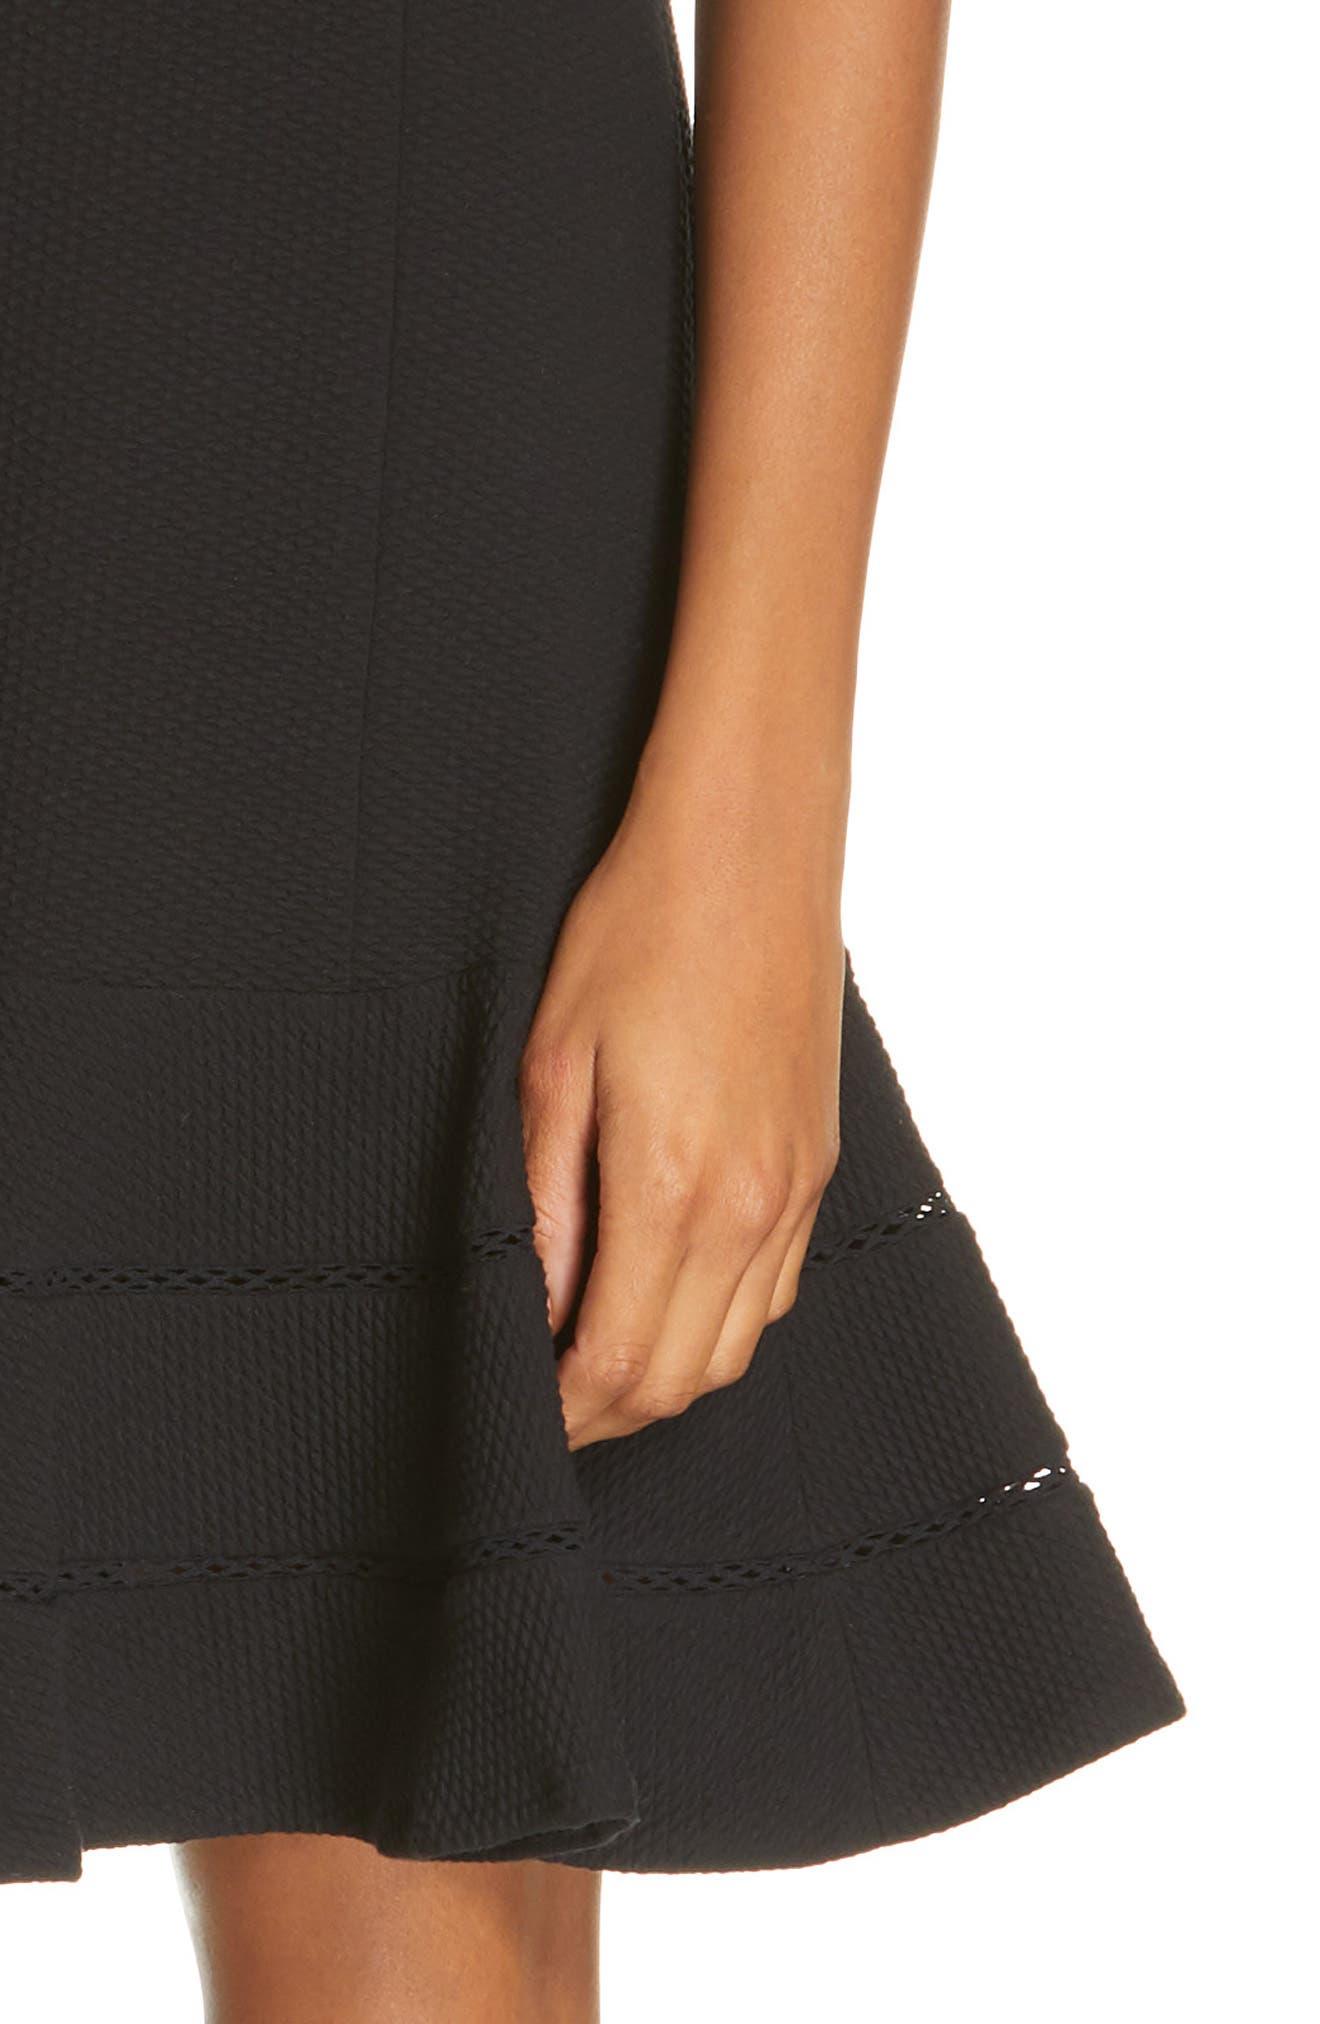 REBECCA TAYLOR, Fit & Flare Dress, Alternate thumbnail 4, color, BLACK